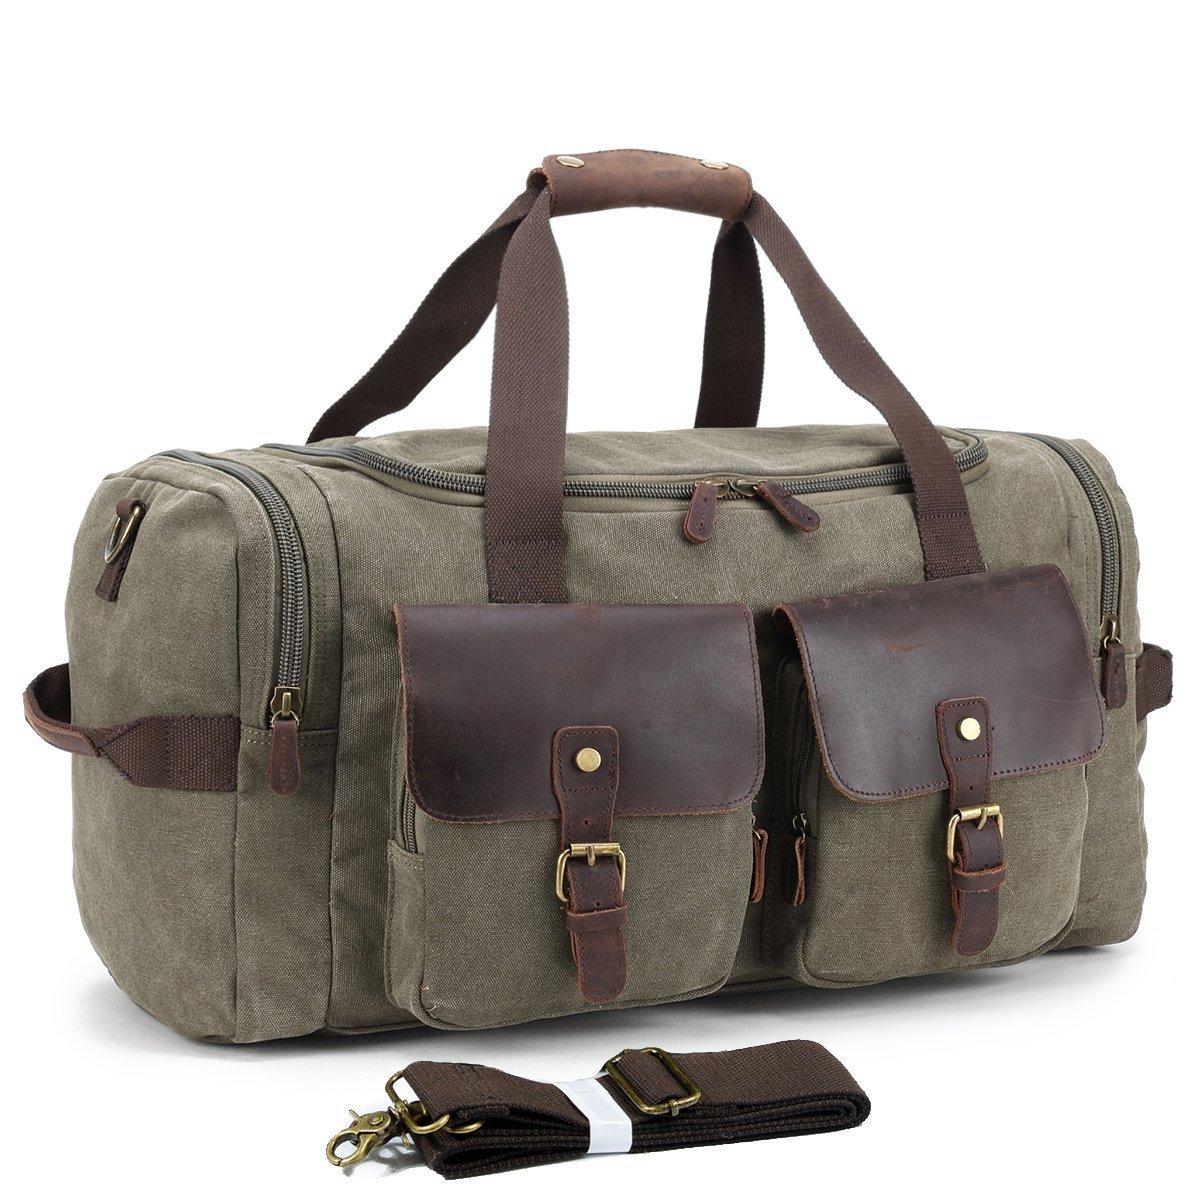 UNISACK Weekender Duffle Bag Canvas Leather Travel Luggage Oversized Holdalls, Army Green